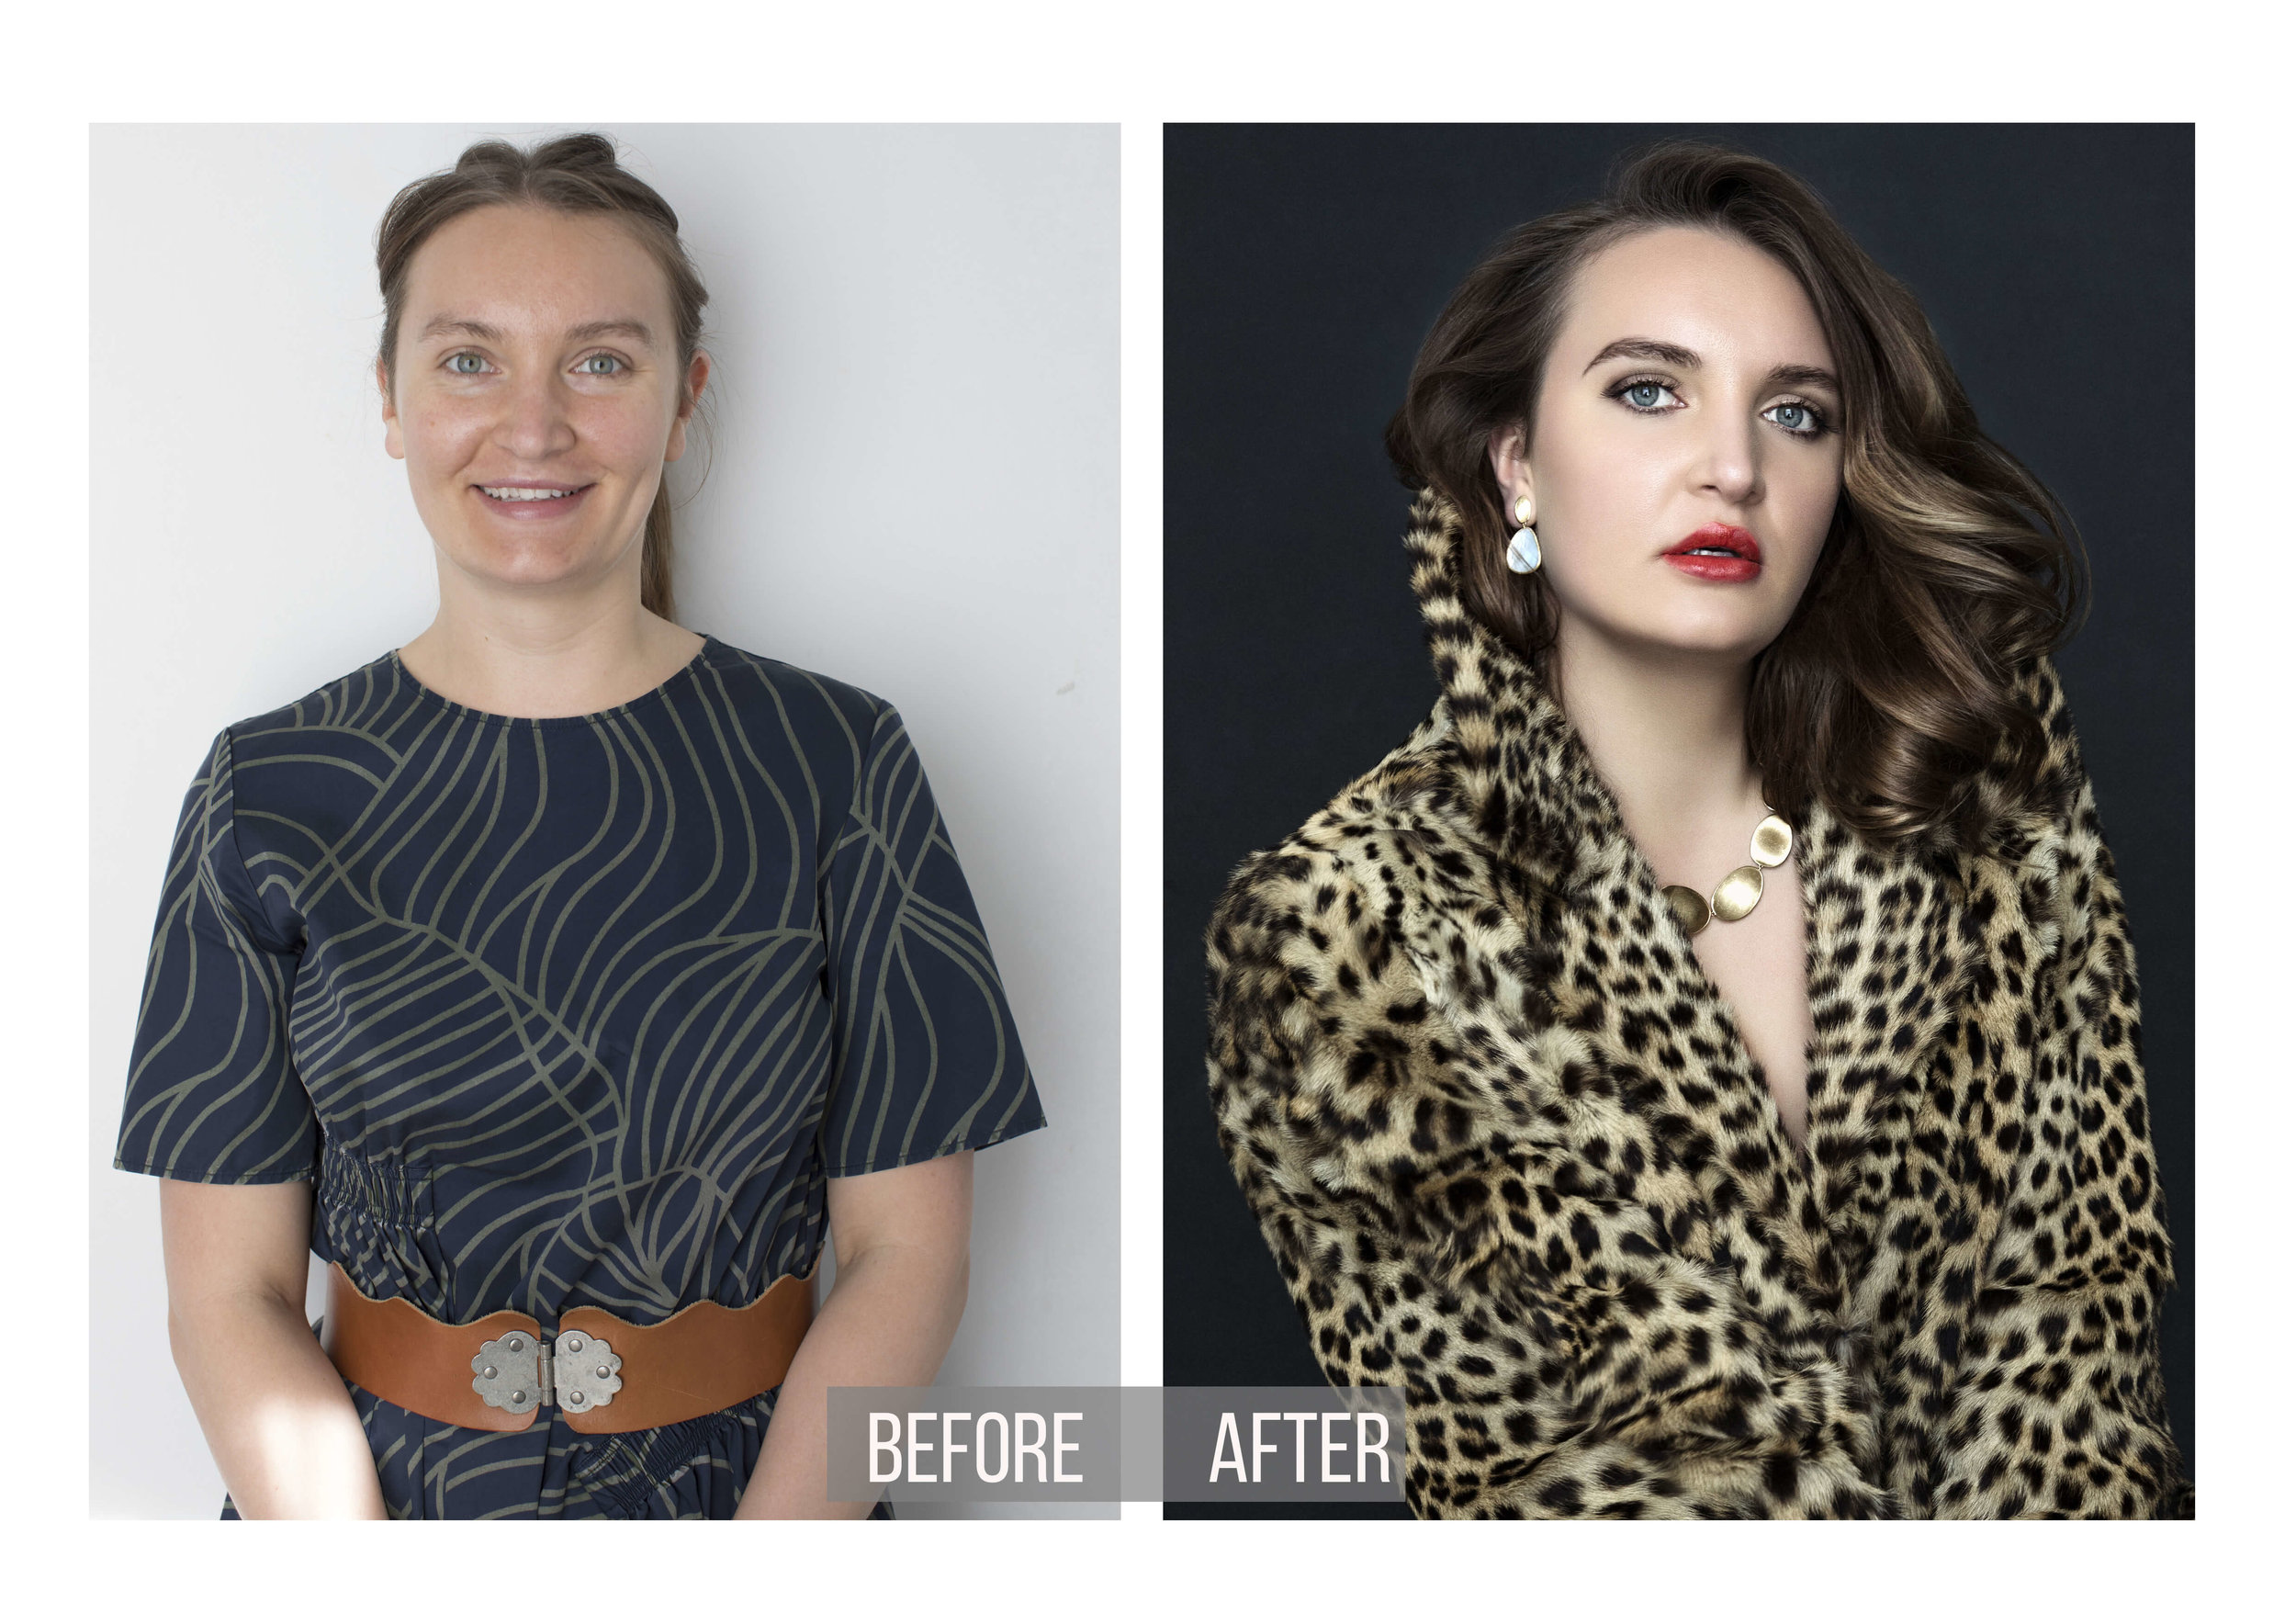 Magazine-Cover-Transformation-Feminine-Portrait-Photo